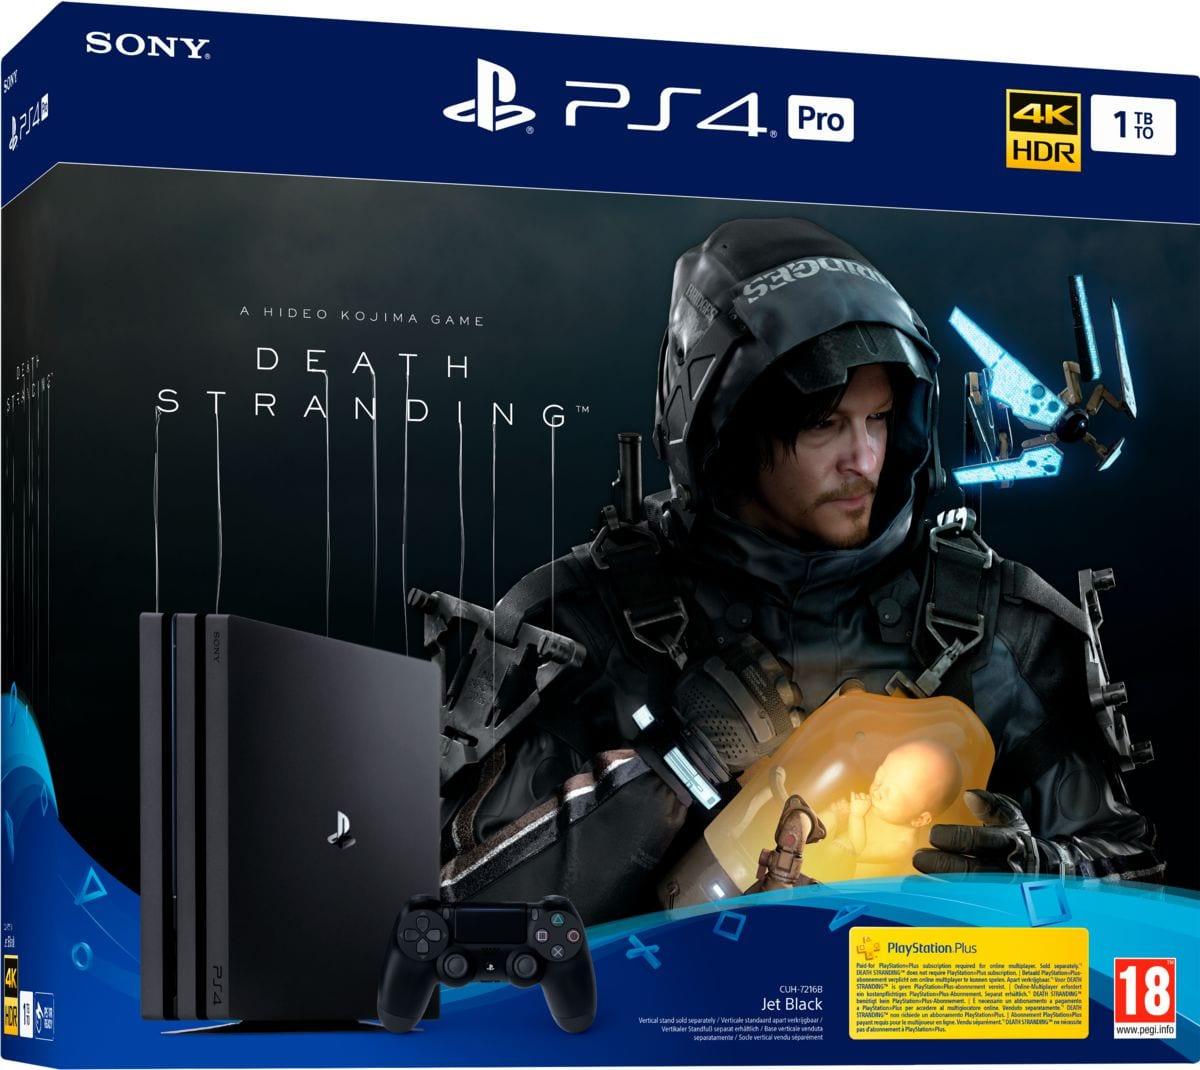 Sony PlayStation 4 1TB PRO + Death Stranding Bundle